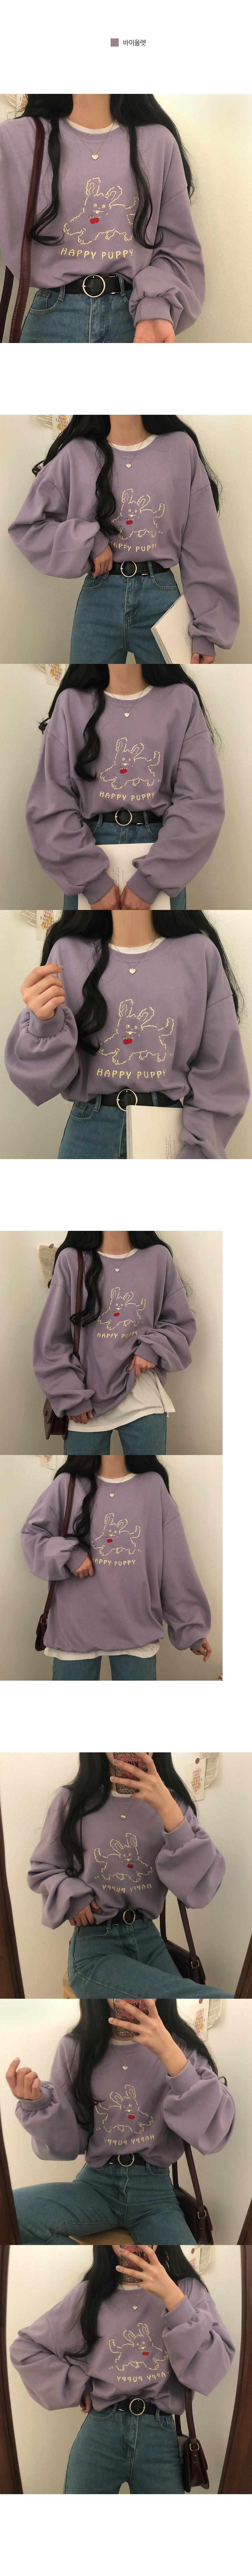 Happy Puppy Embroidered Loose Sweatshirt